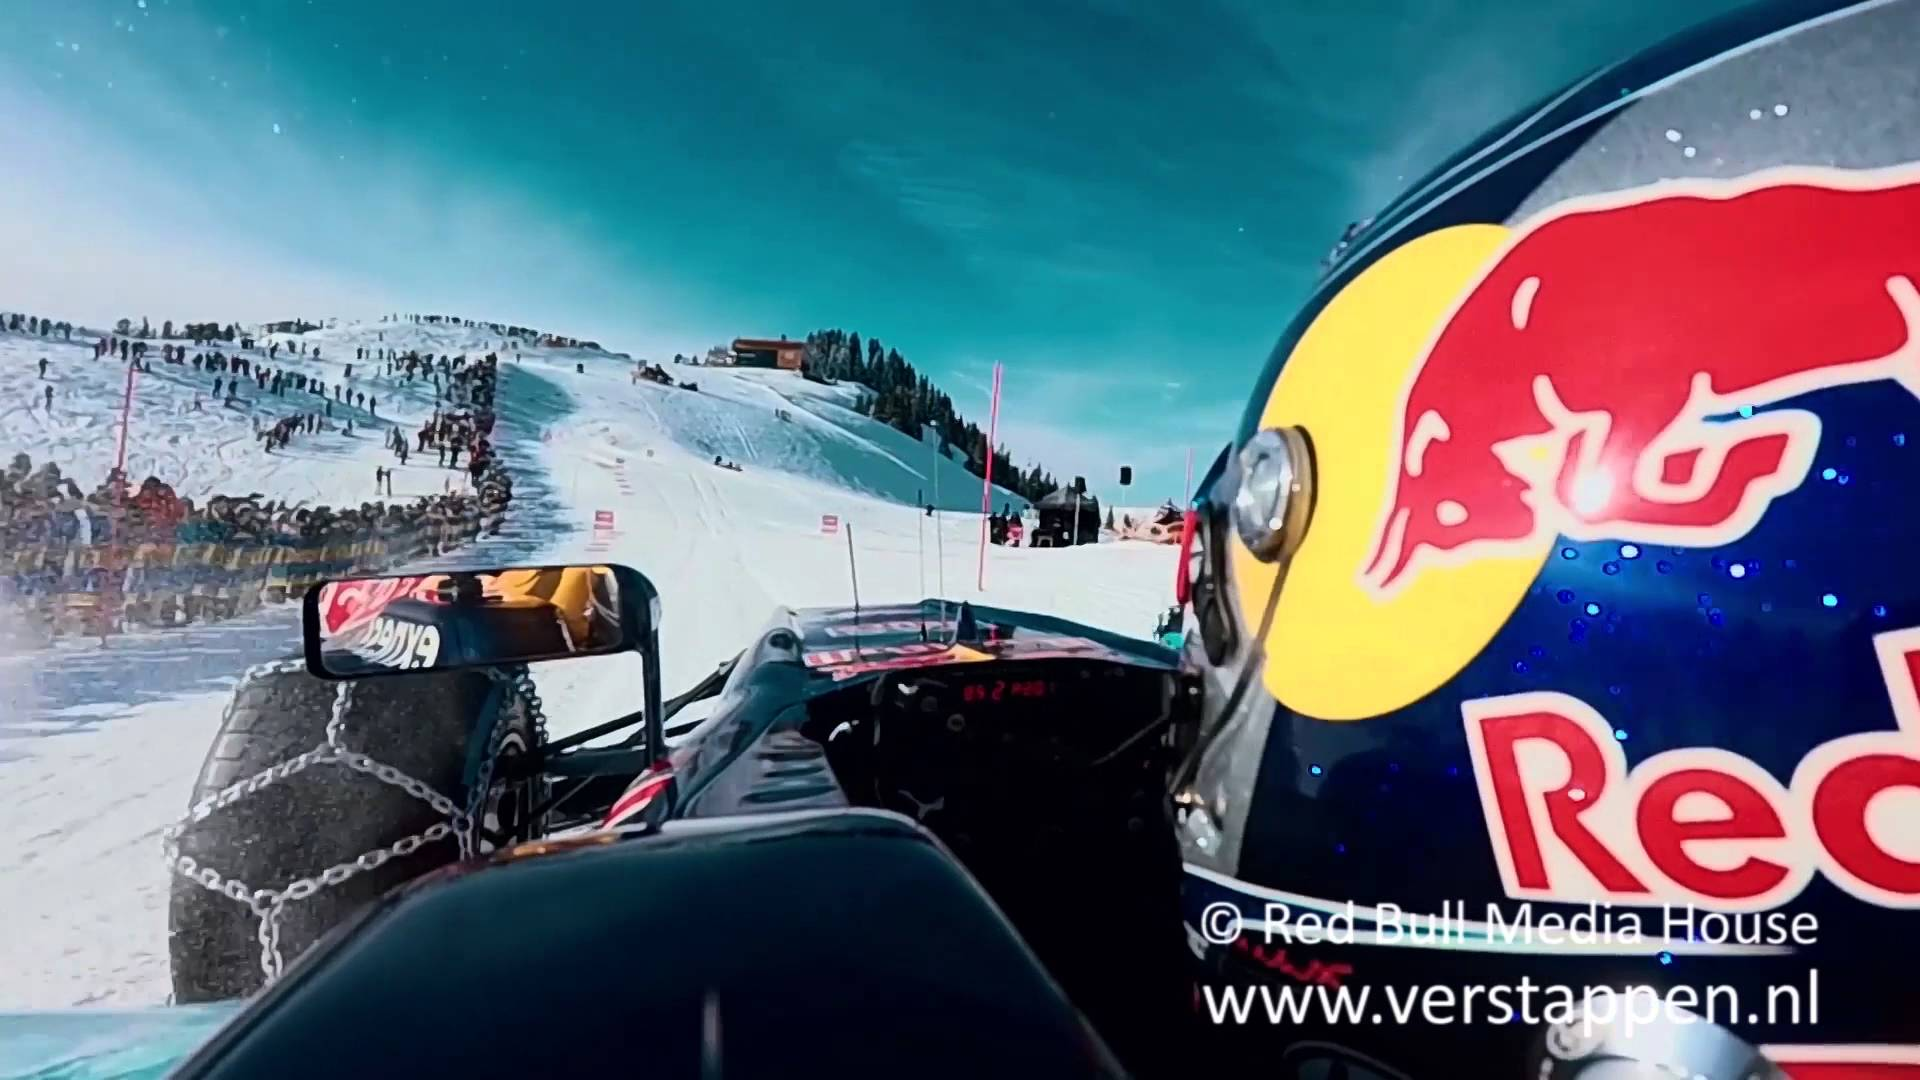 Max Verstappen vs. Aksel Lund Svindal on top of Hahnenkamm mountain, Kitzbühel, 14/01/2016